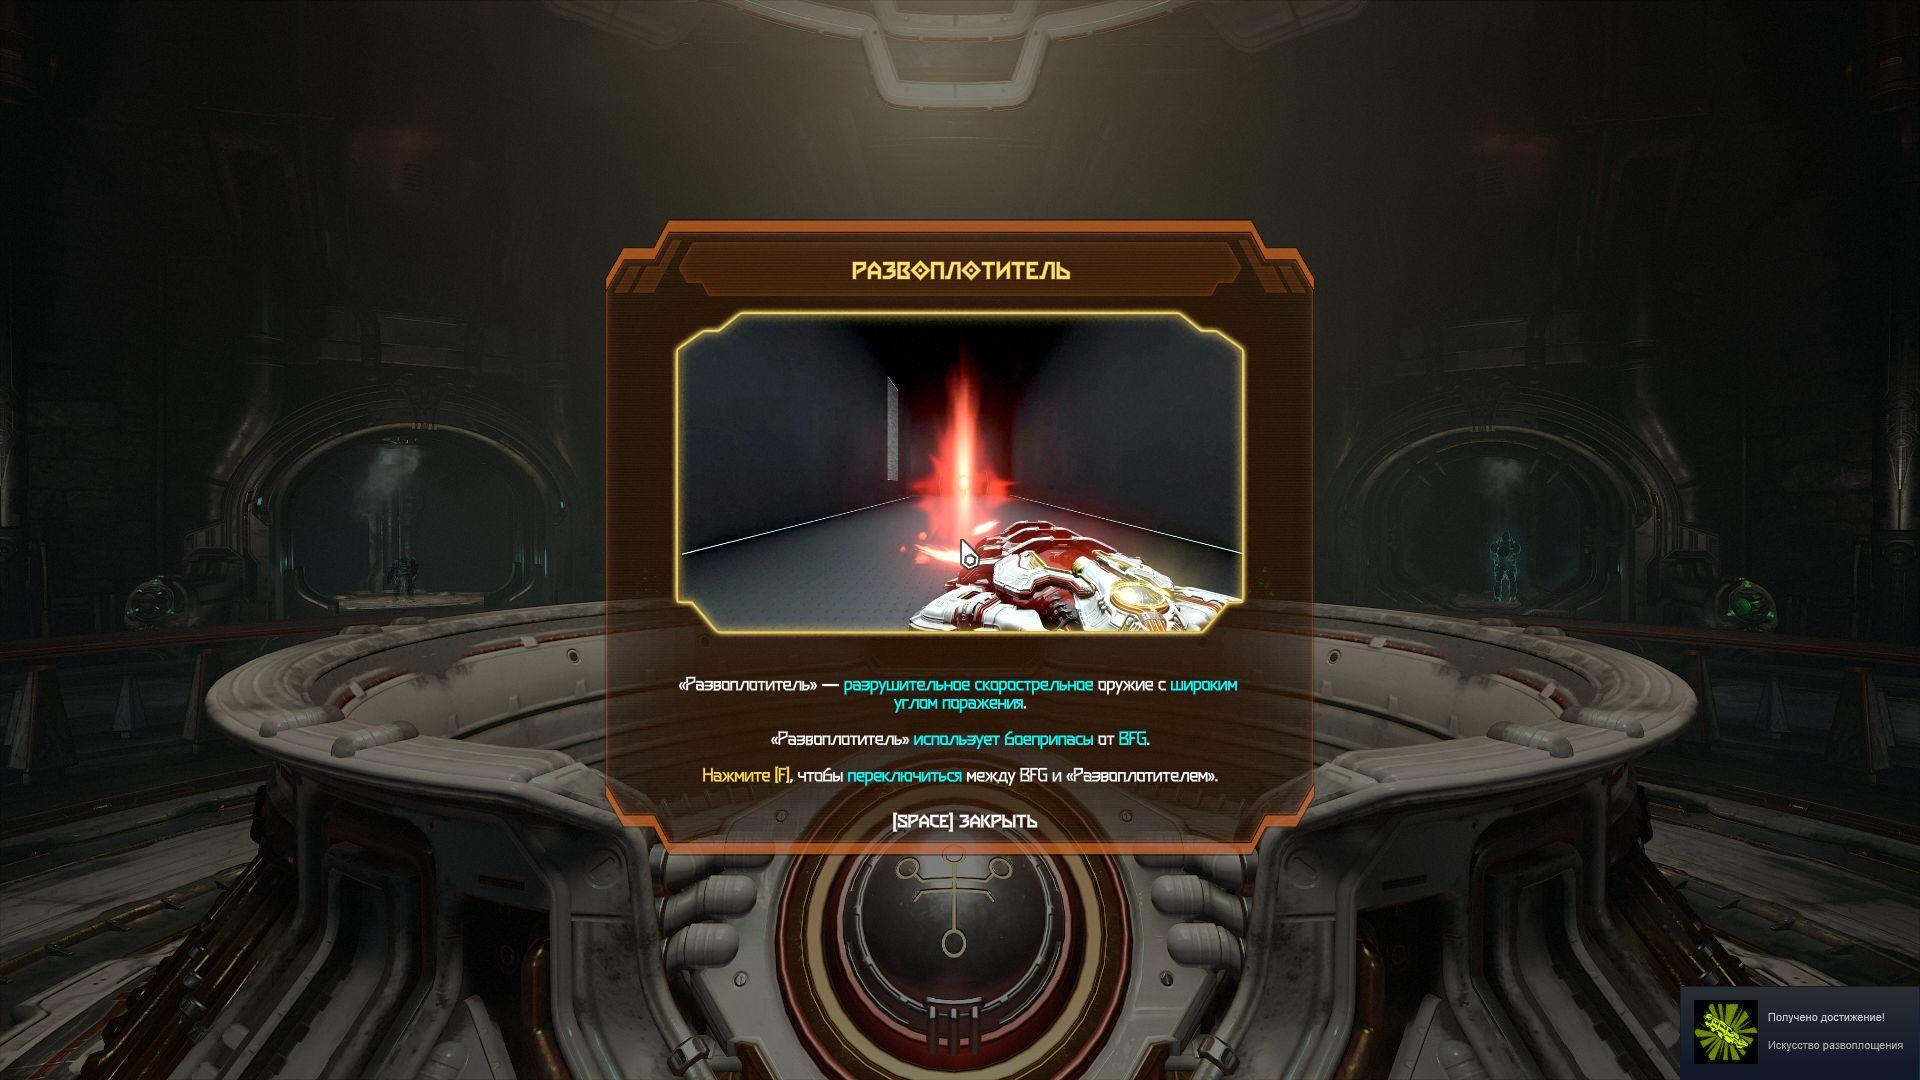 00097.Jpg - Doom Eternal